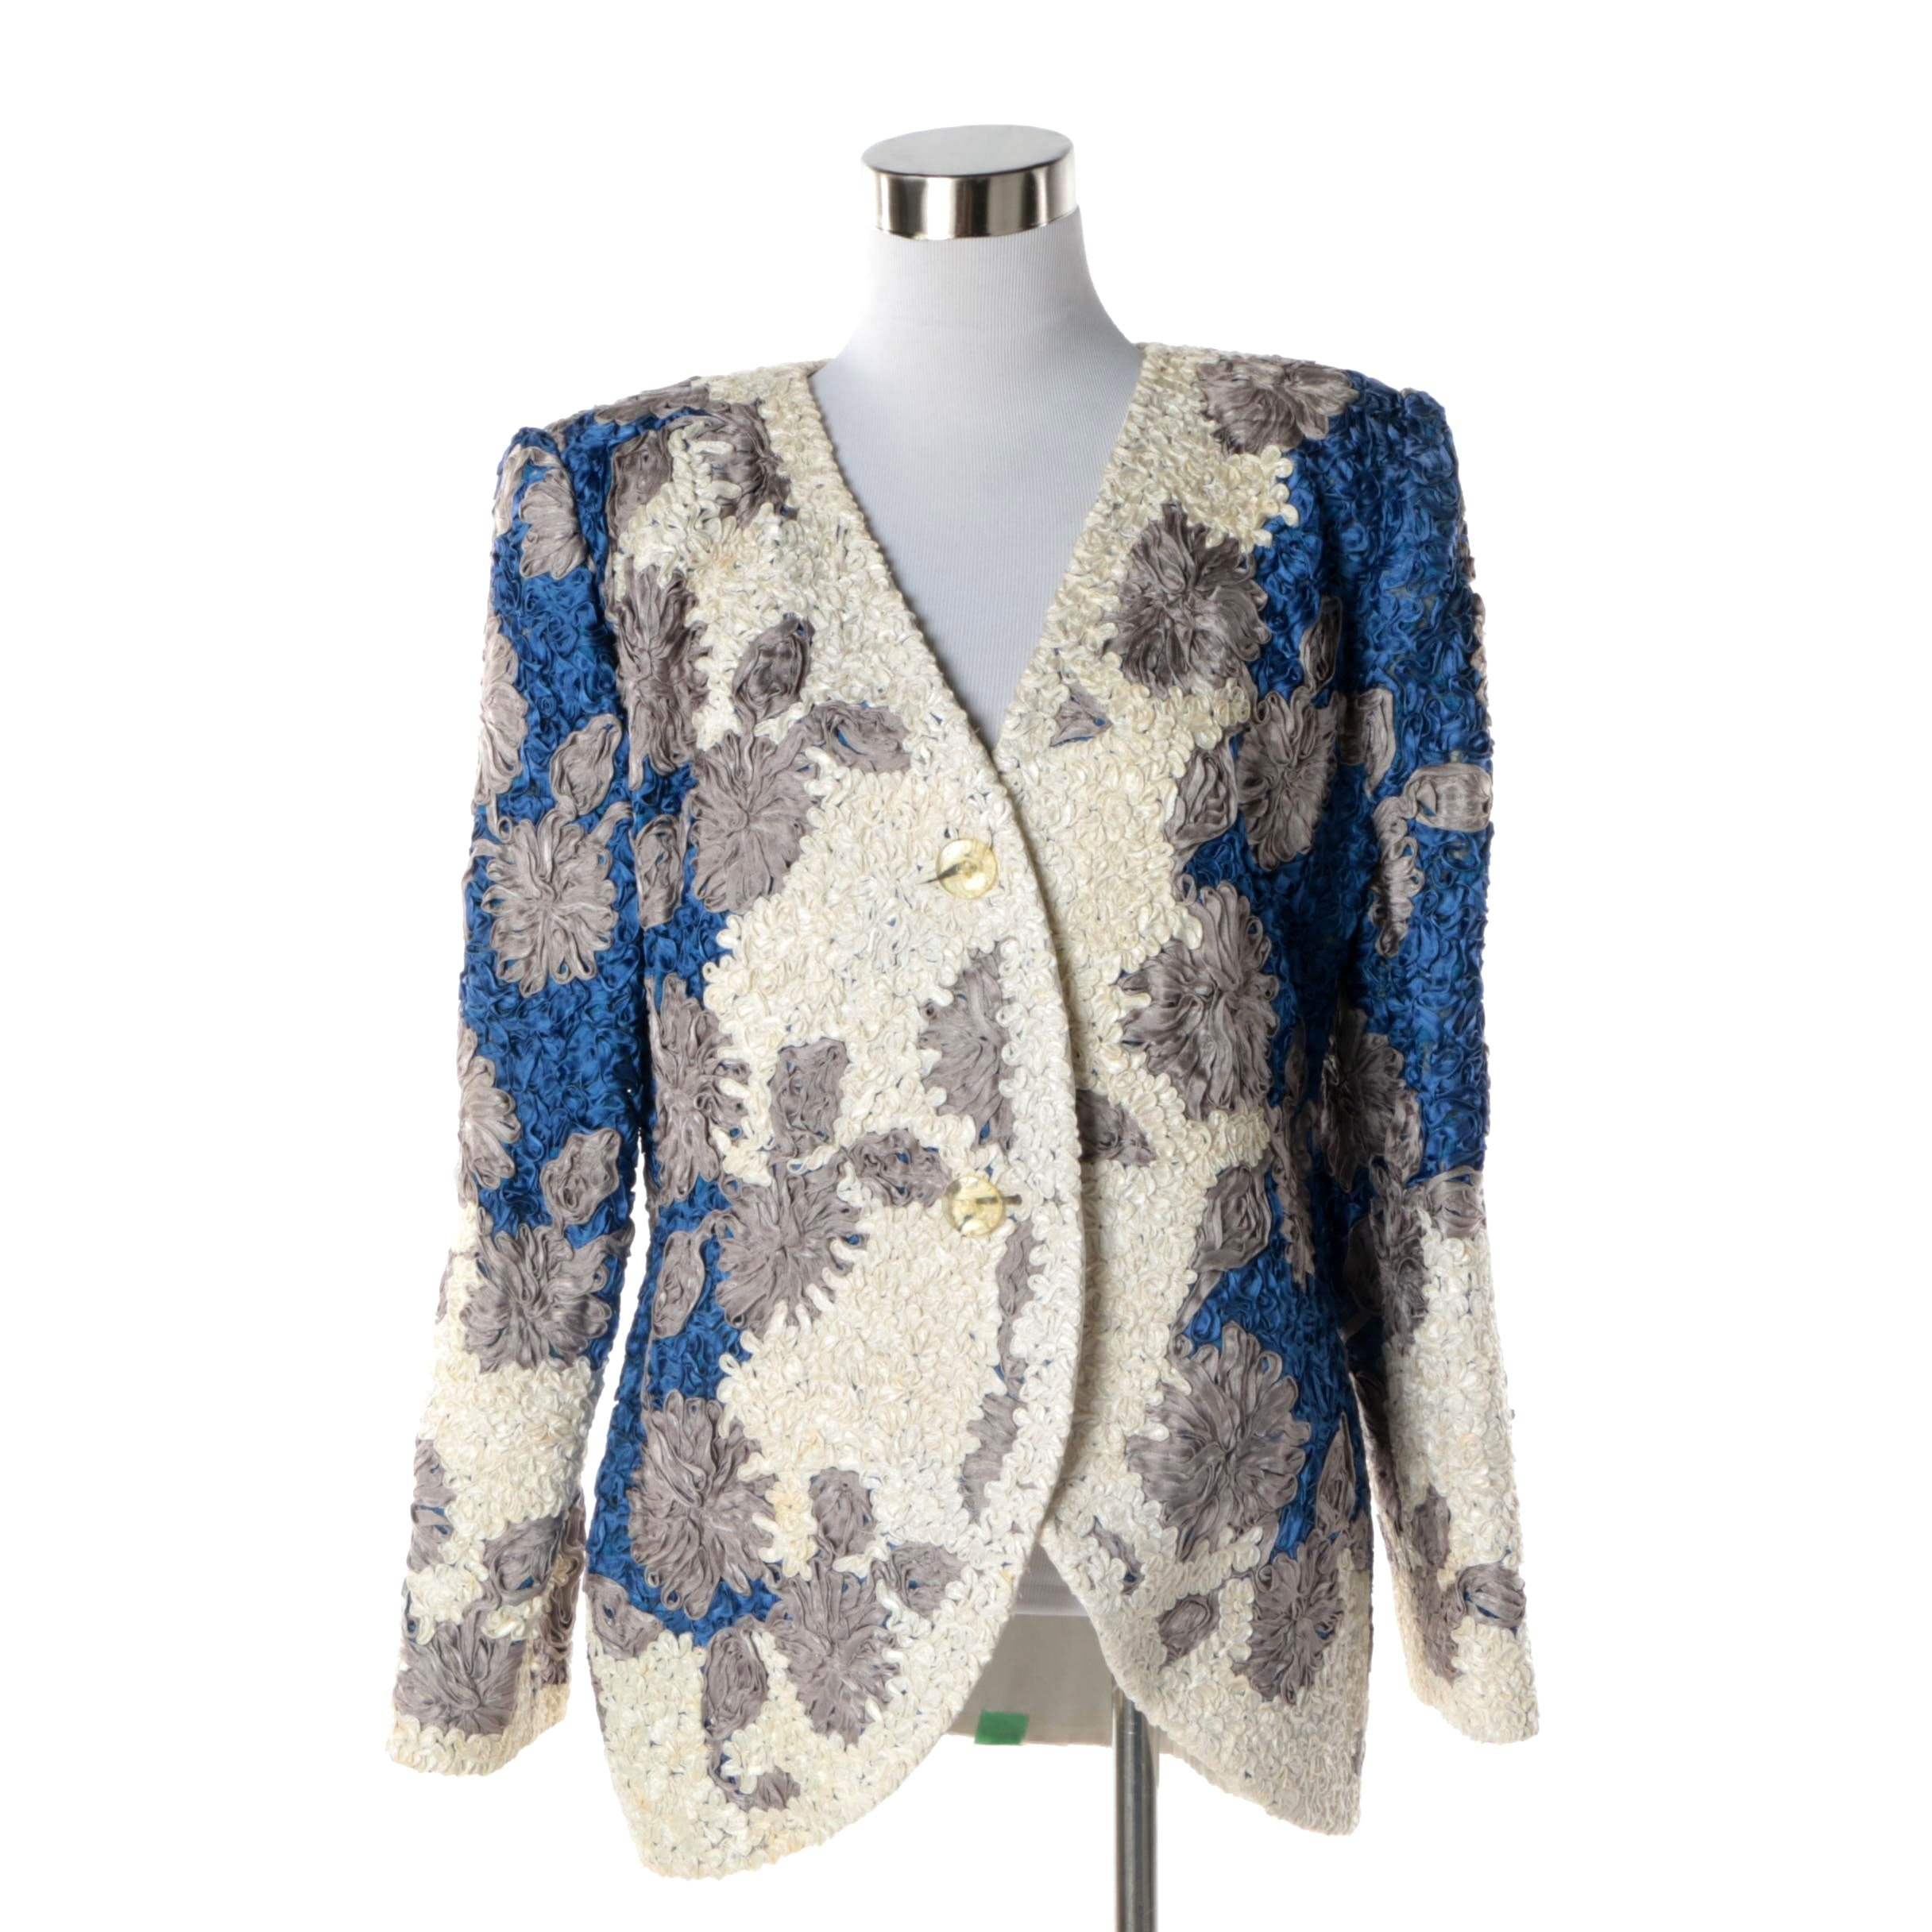 Women's Circa 1980s Vintage Galanos Blue, Grey and White Silk Jacket